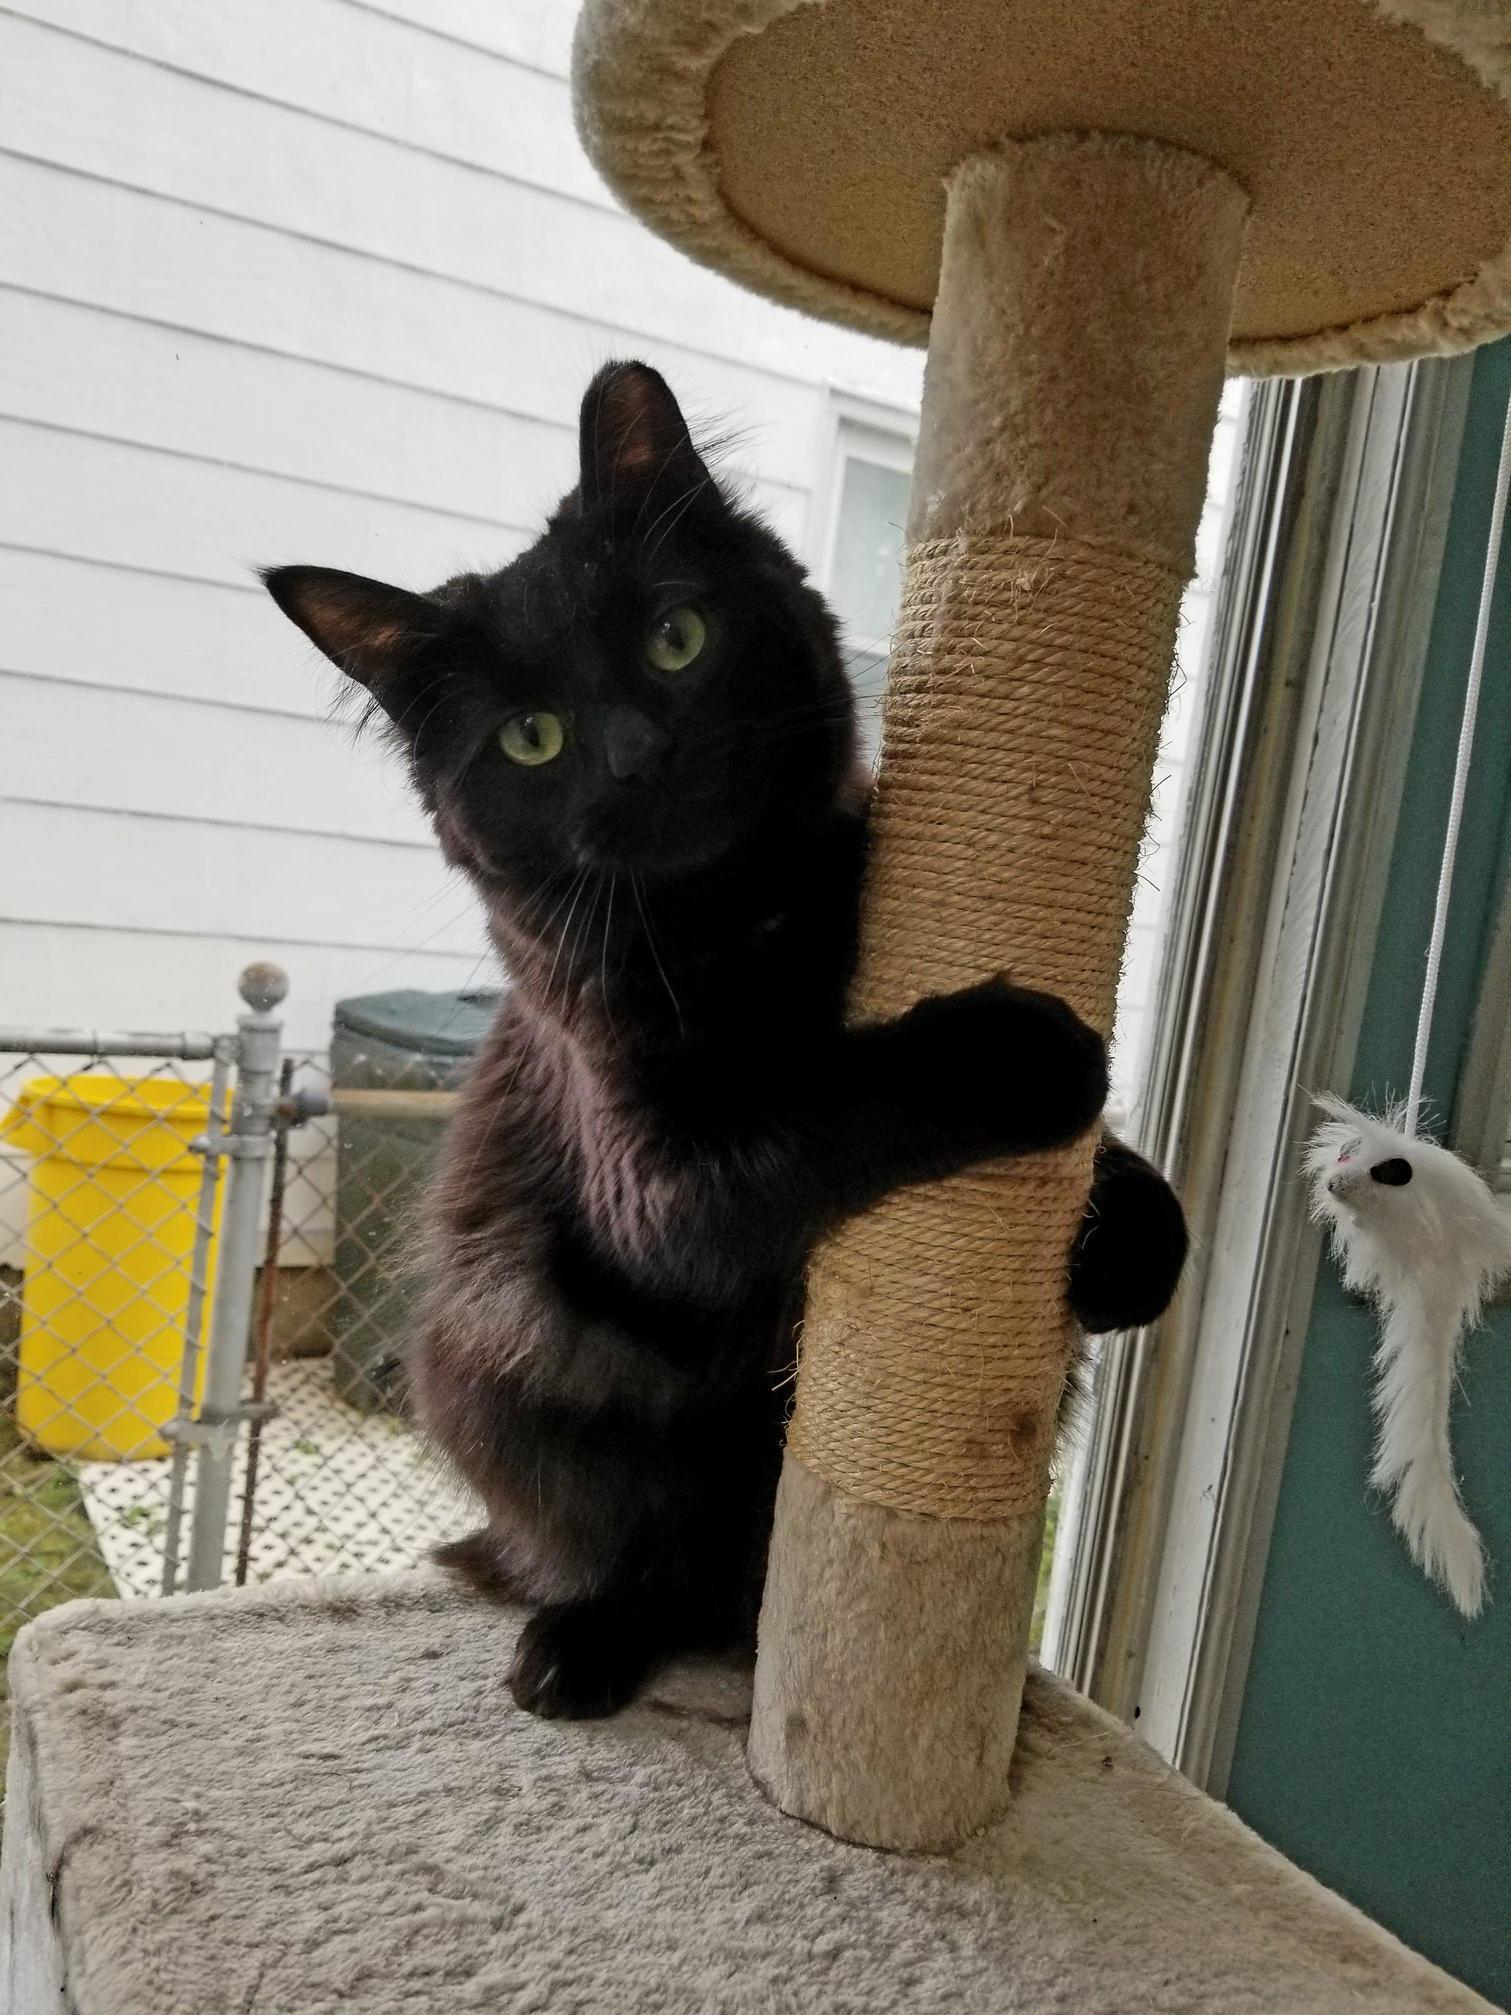 Posing or pole dancing